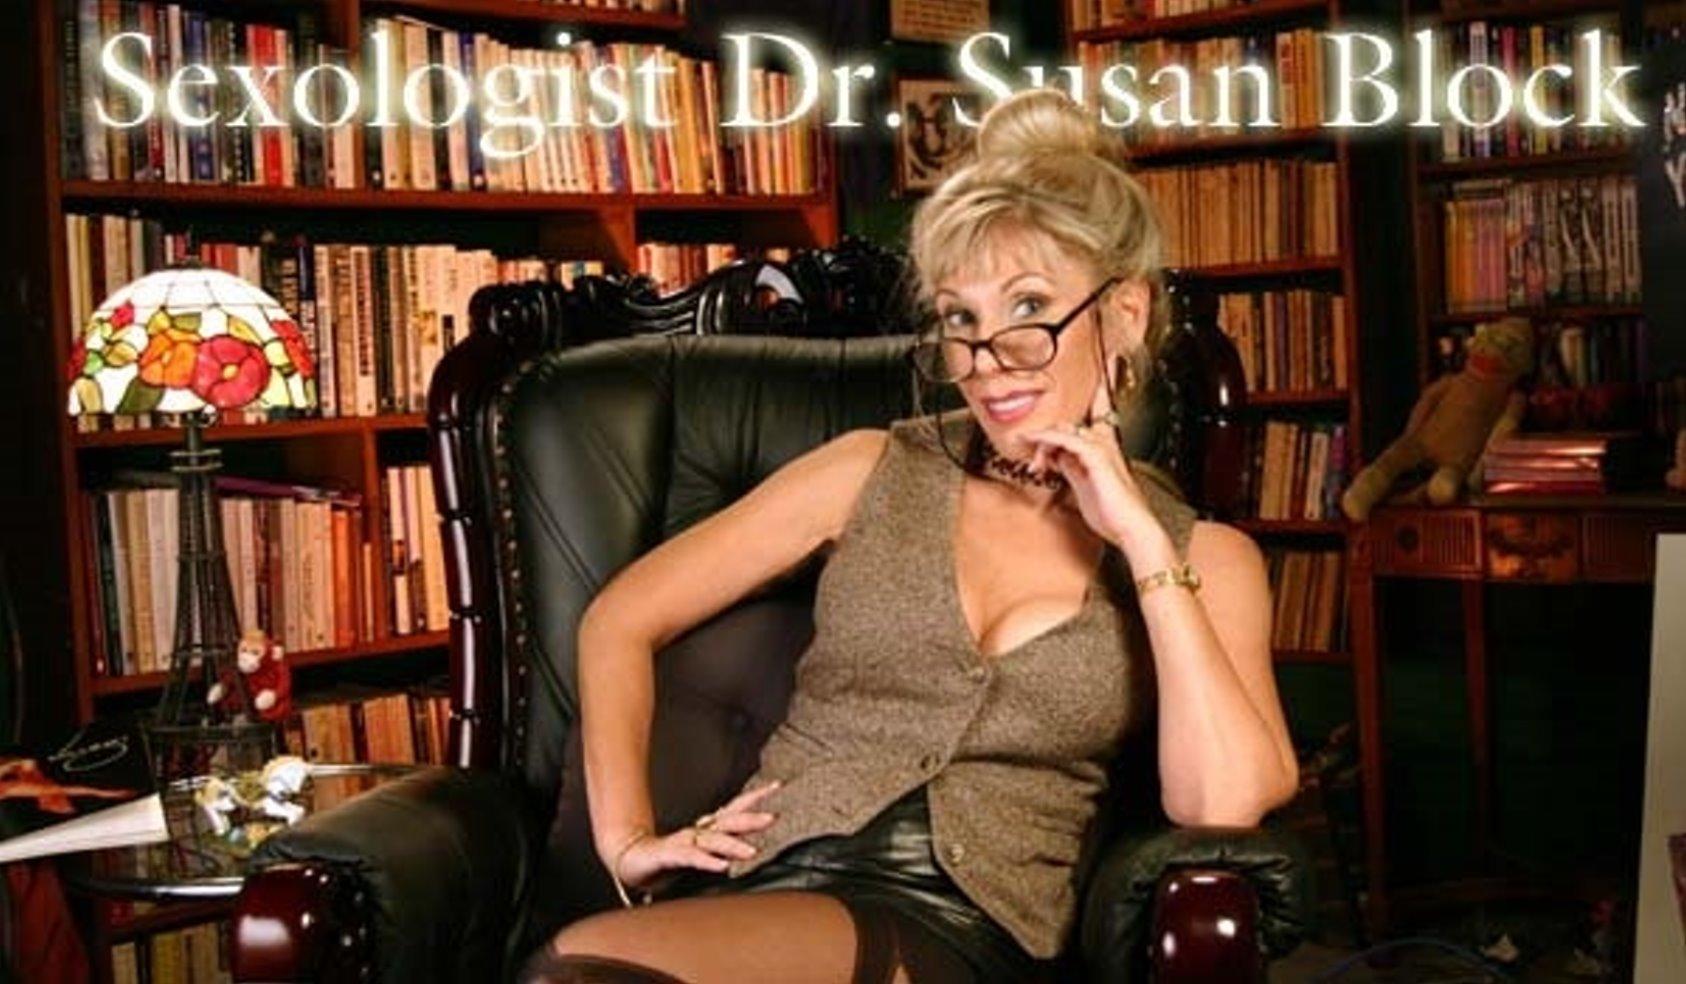 DrSusanBlock_Sexologist_300dpi